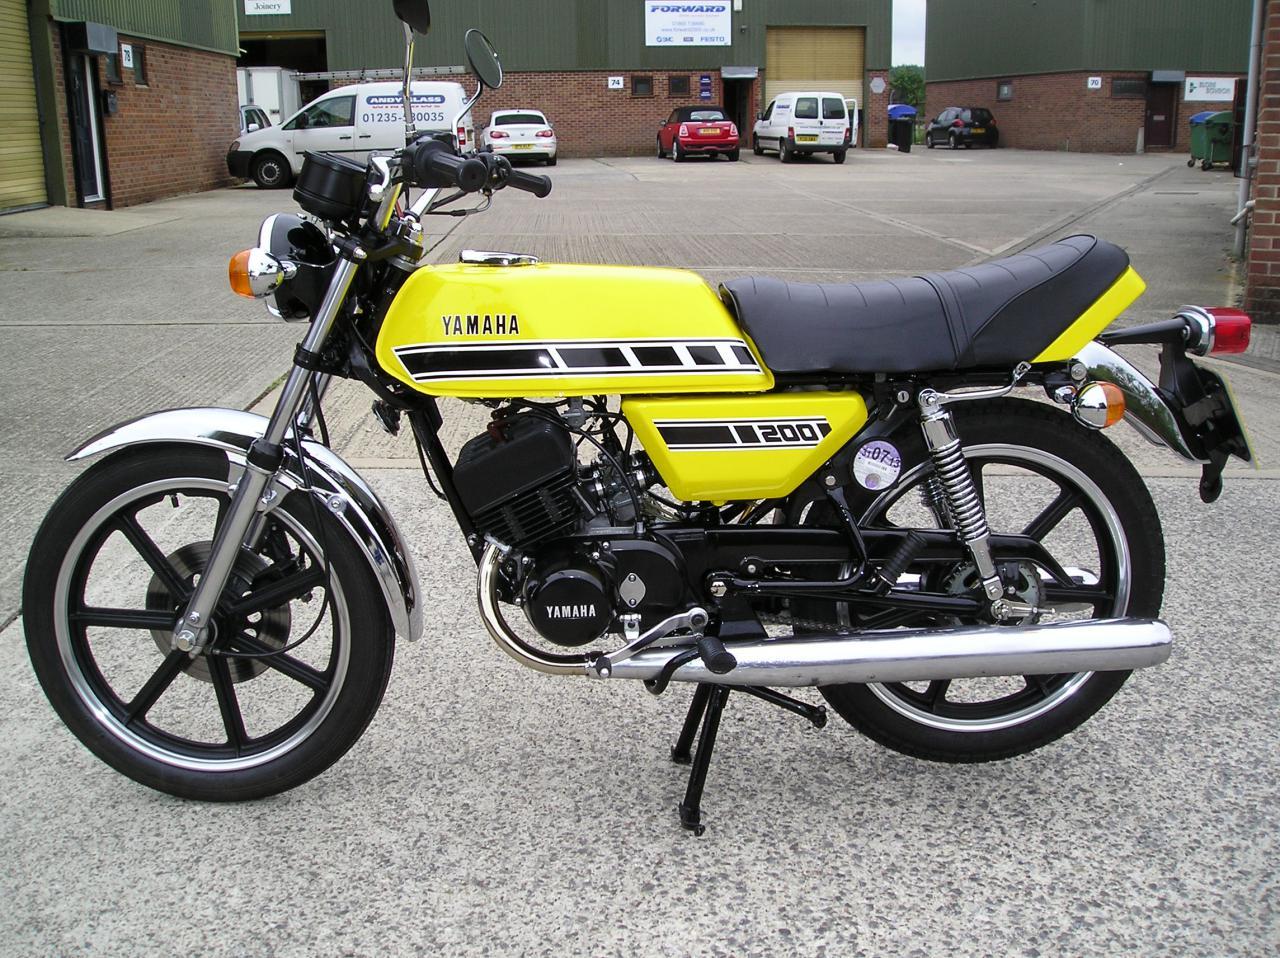 Yamaha Rd Club